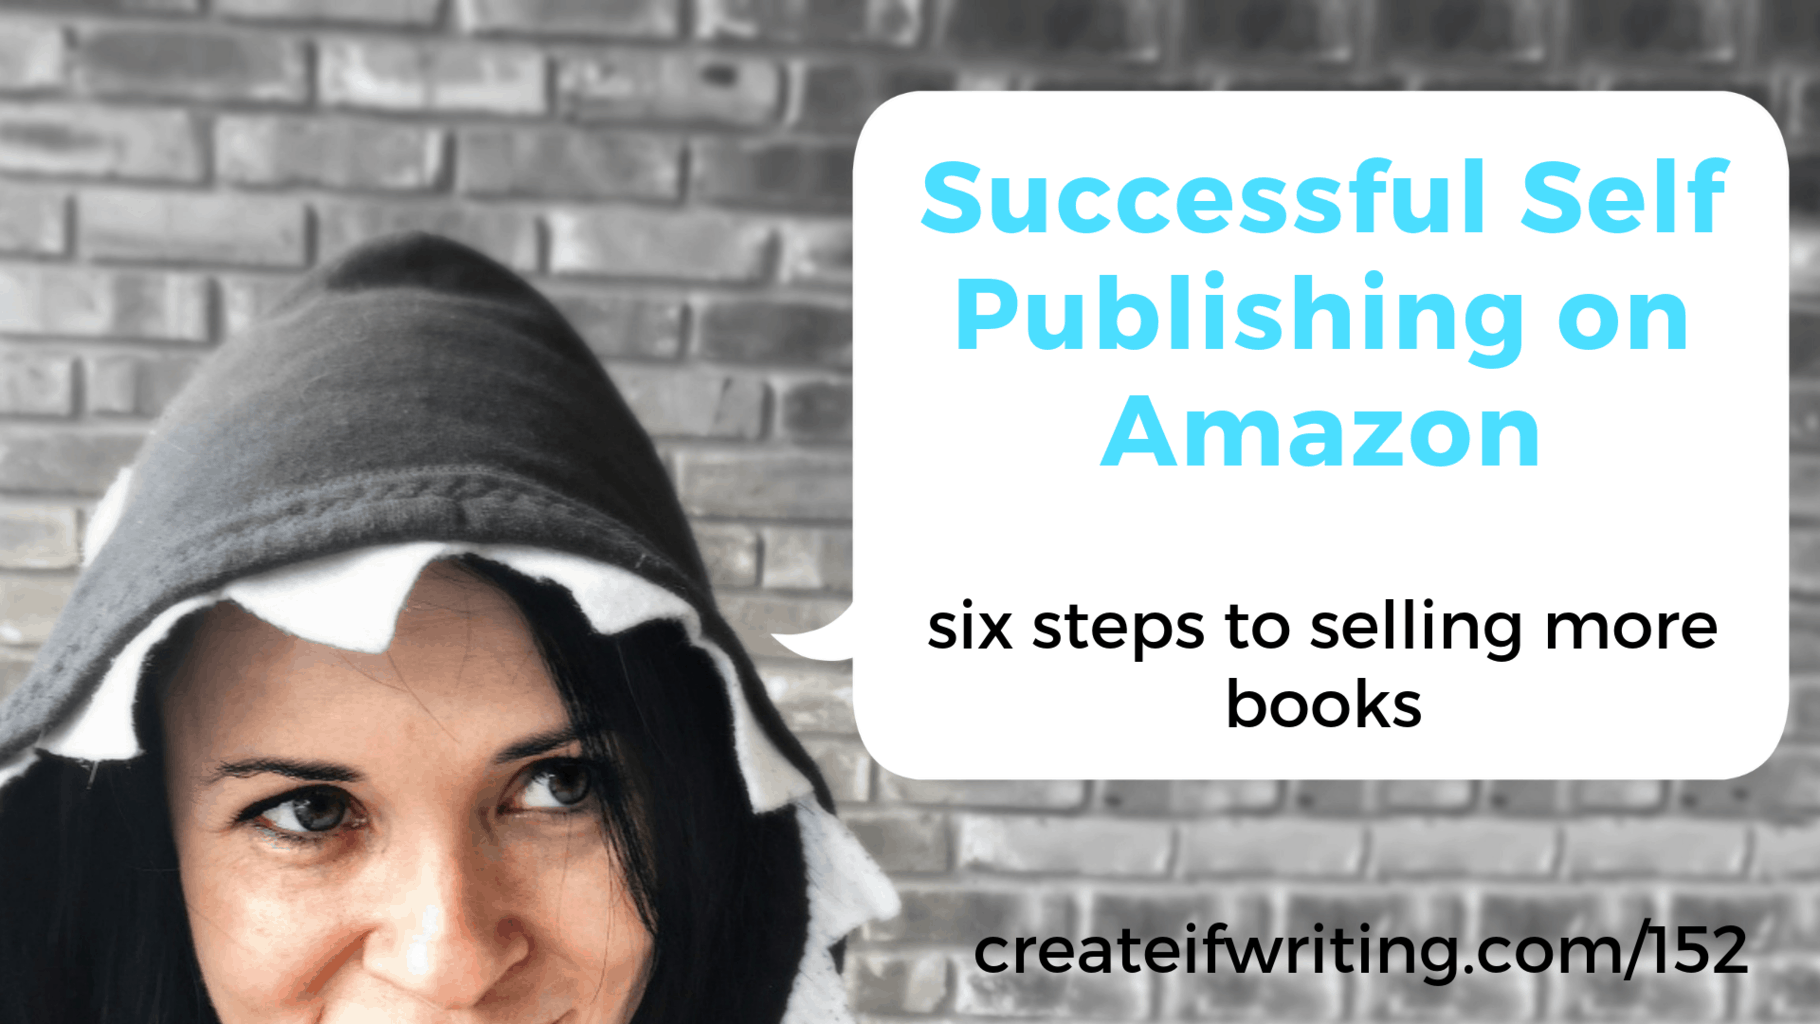 Successful Self Publishing on Amazon: Six Strategies That Work